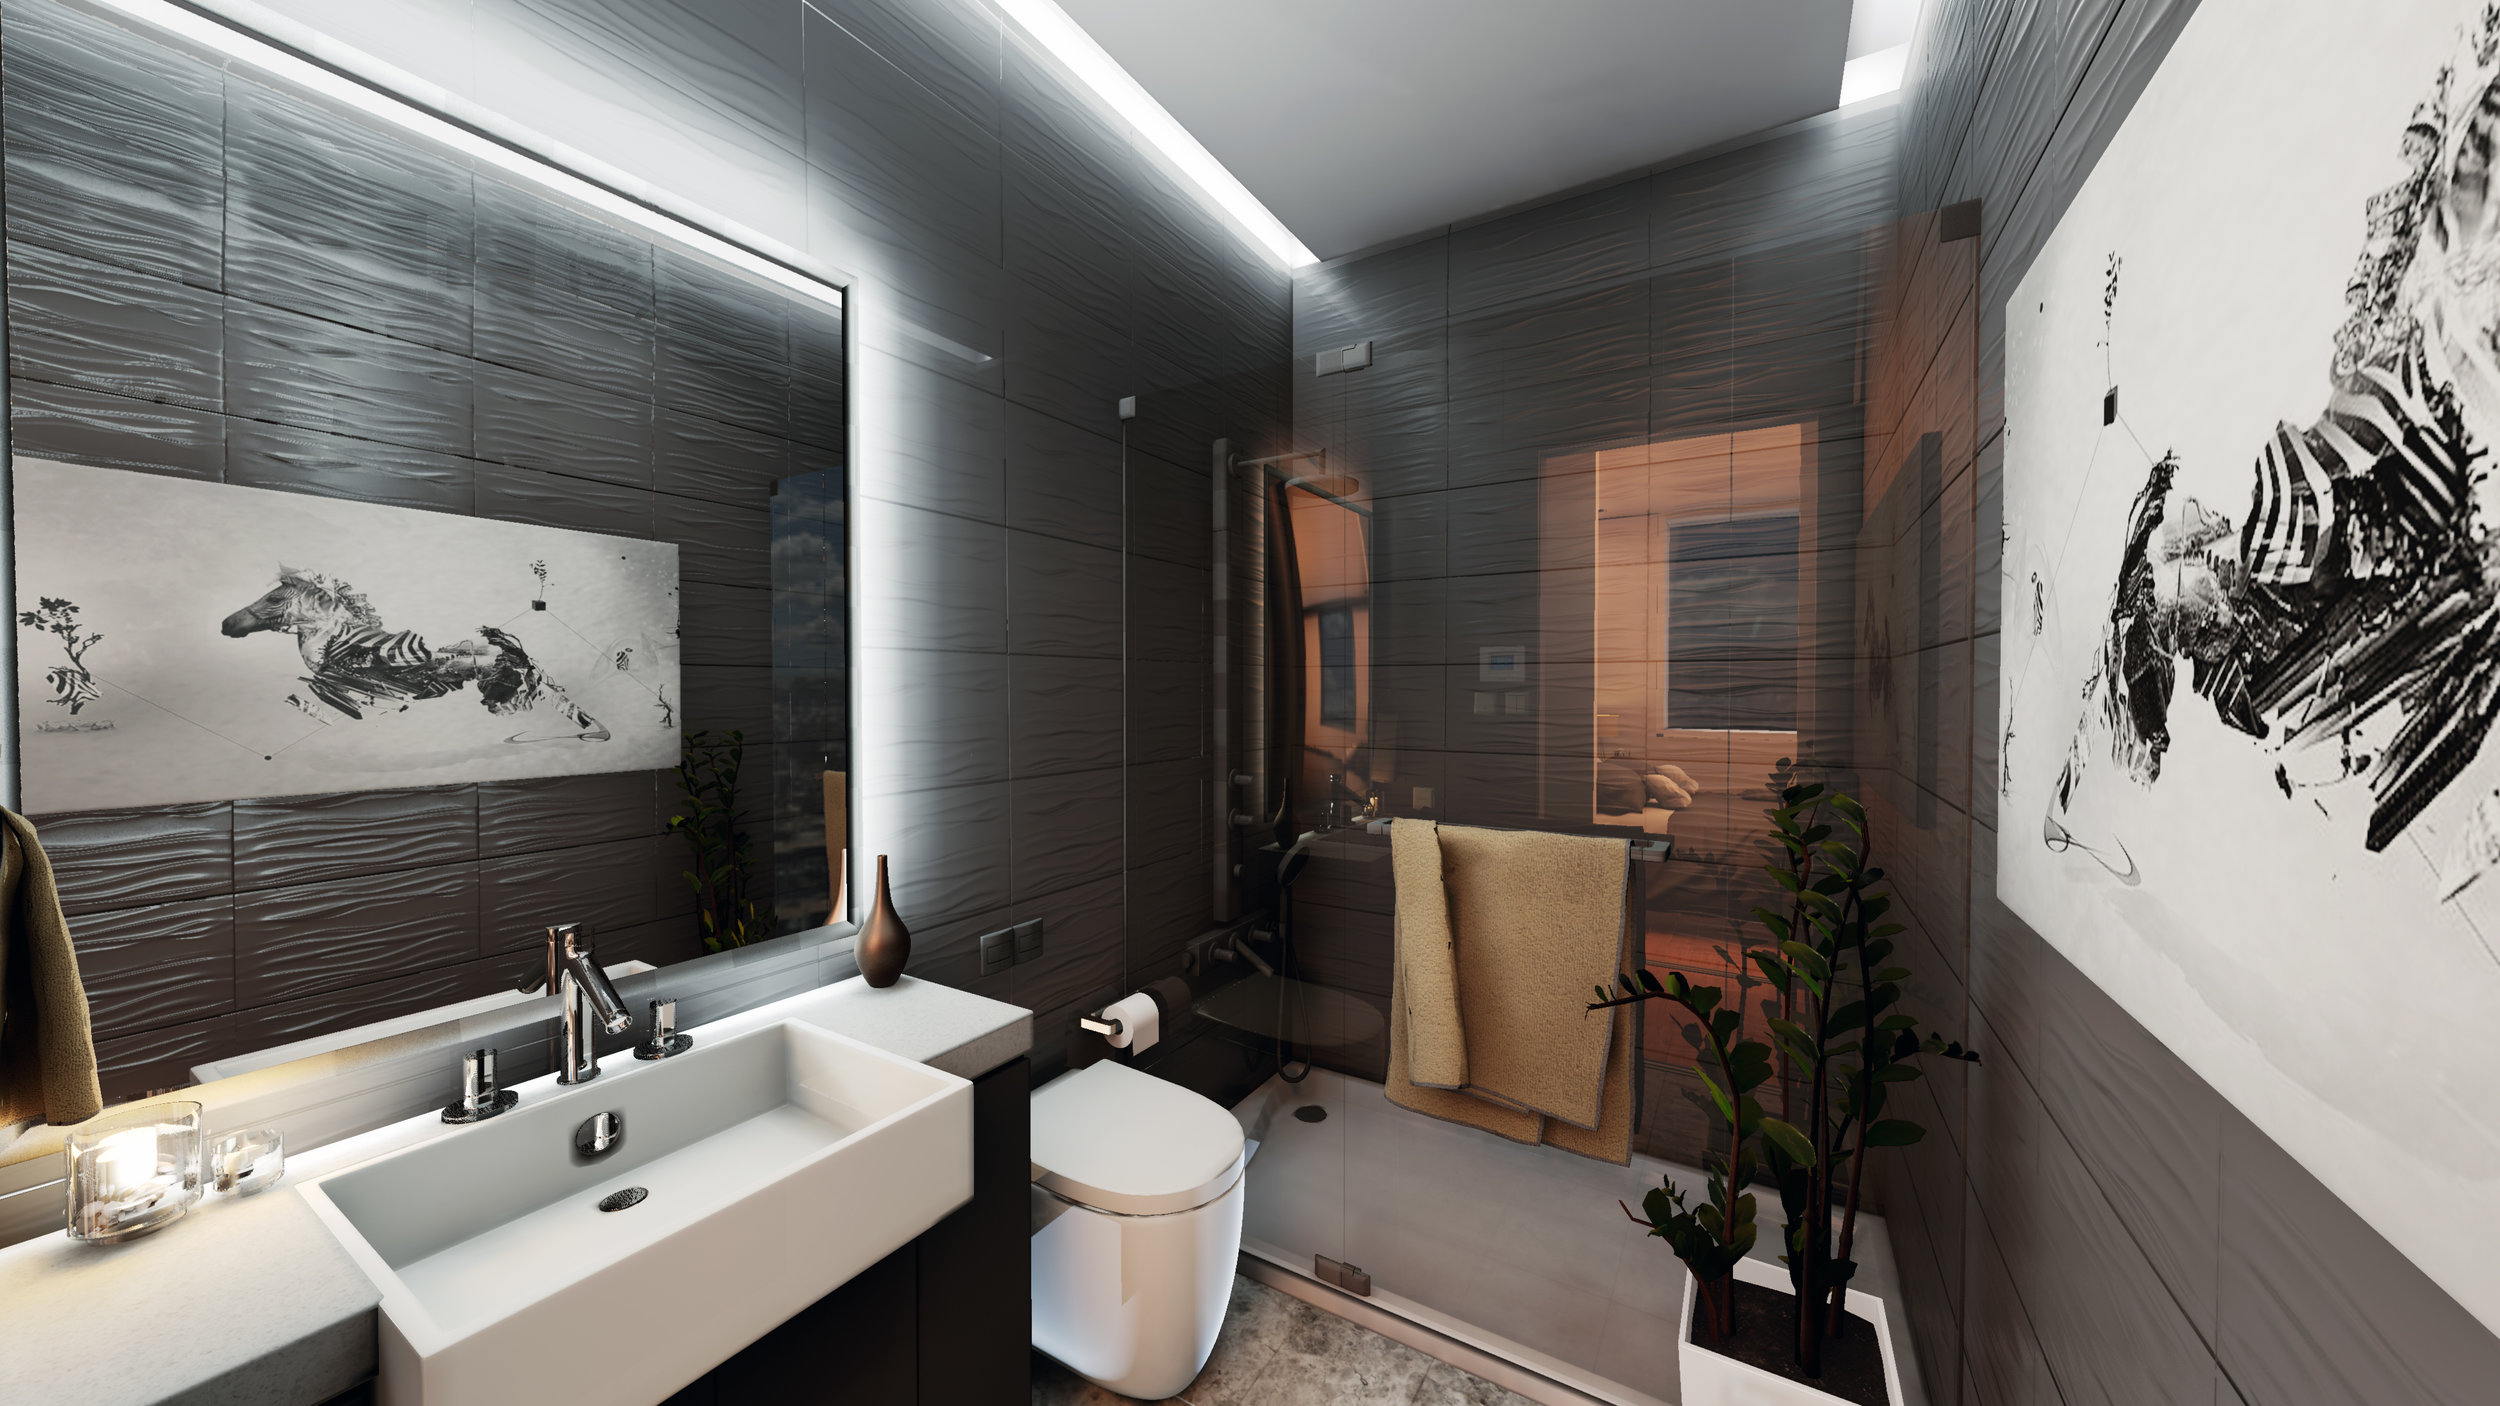 Apartment02_0001.jpg